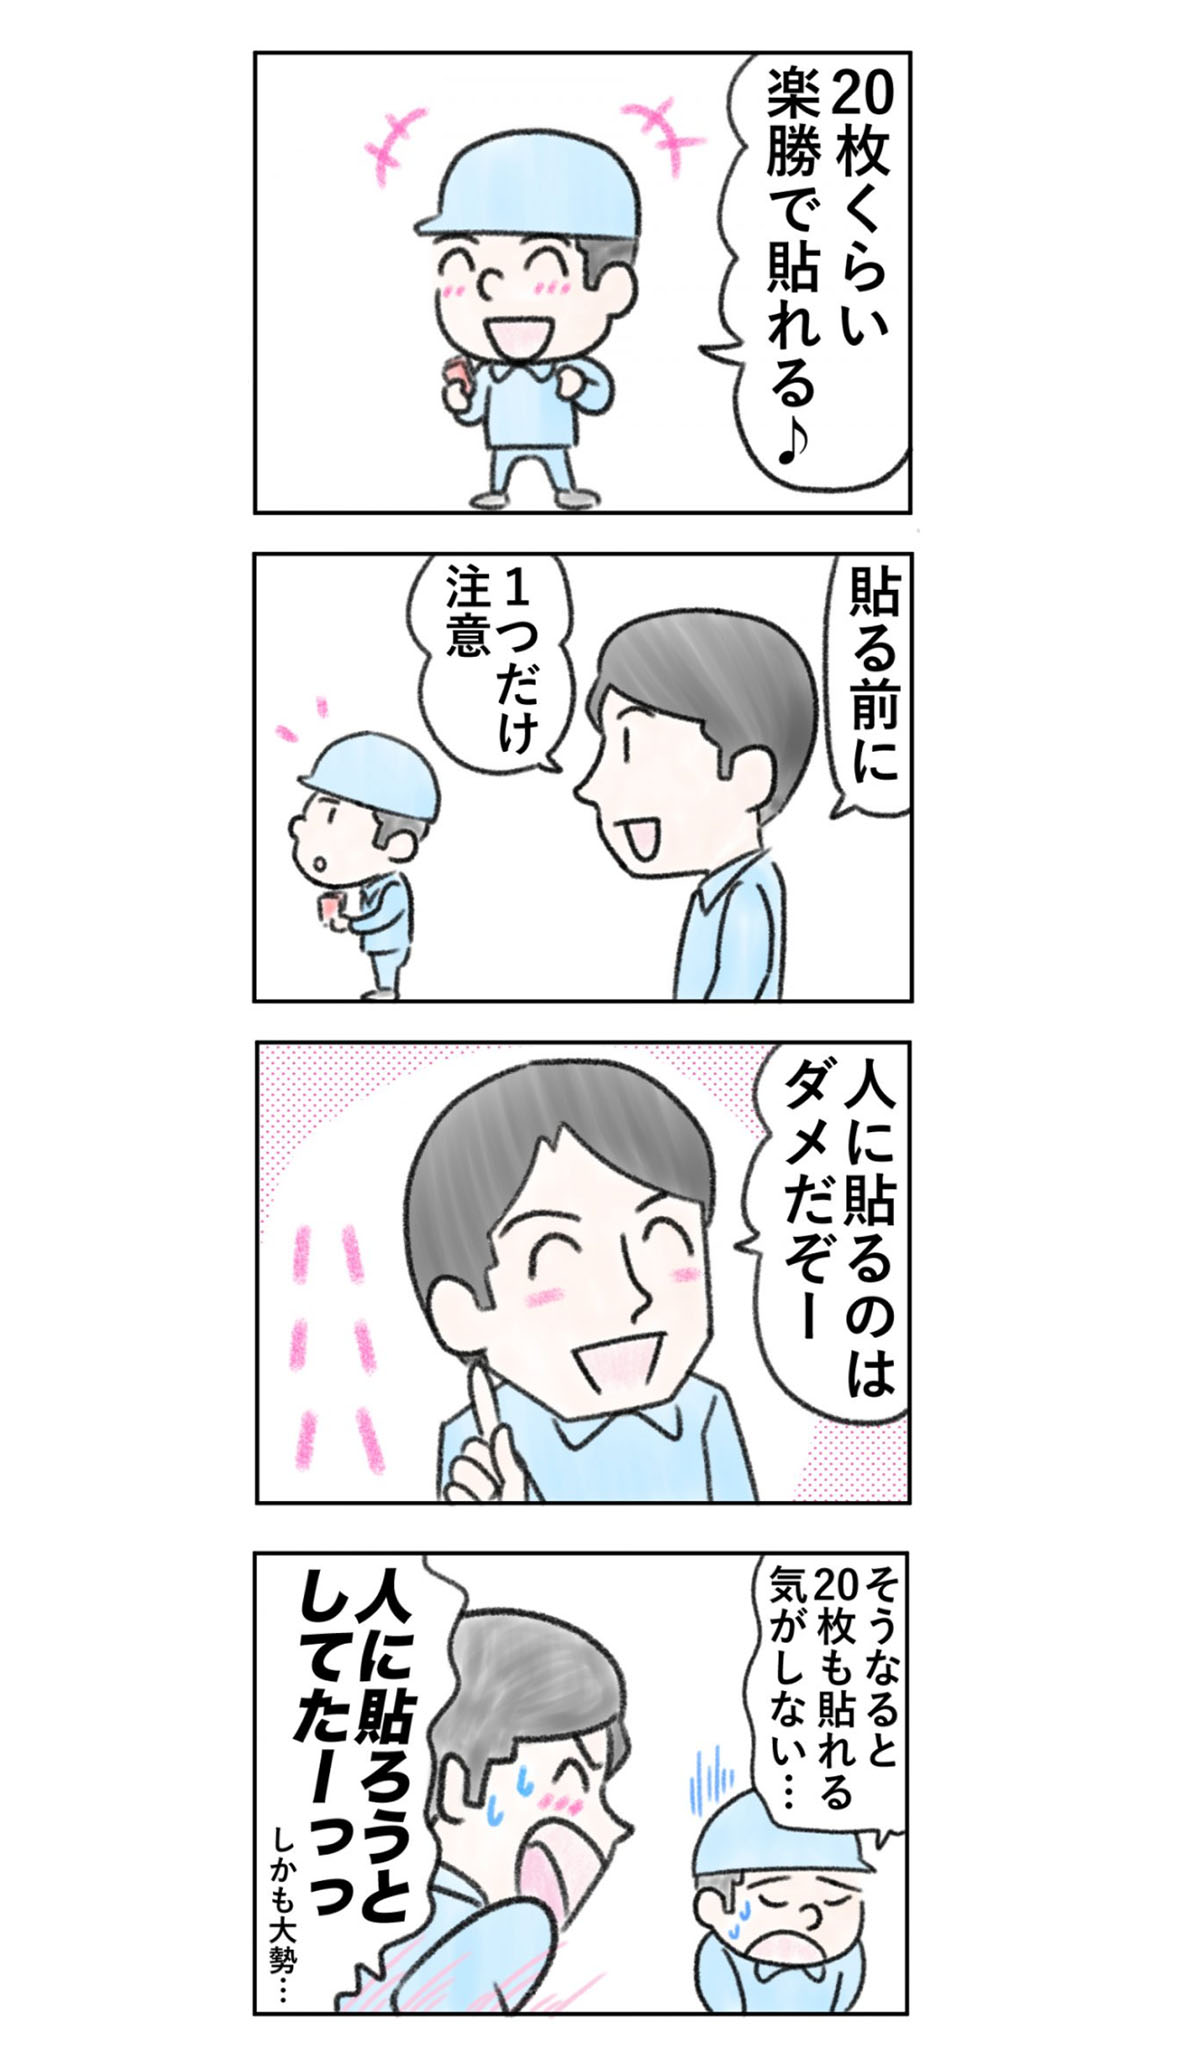 screencapture-kakiuchikaizen-archives-199-1490777832113のコピー